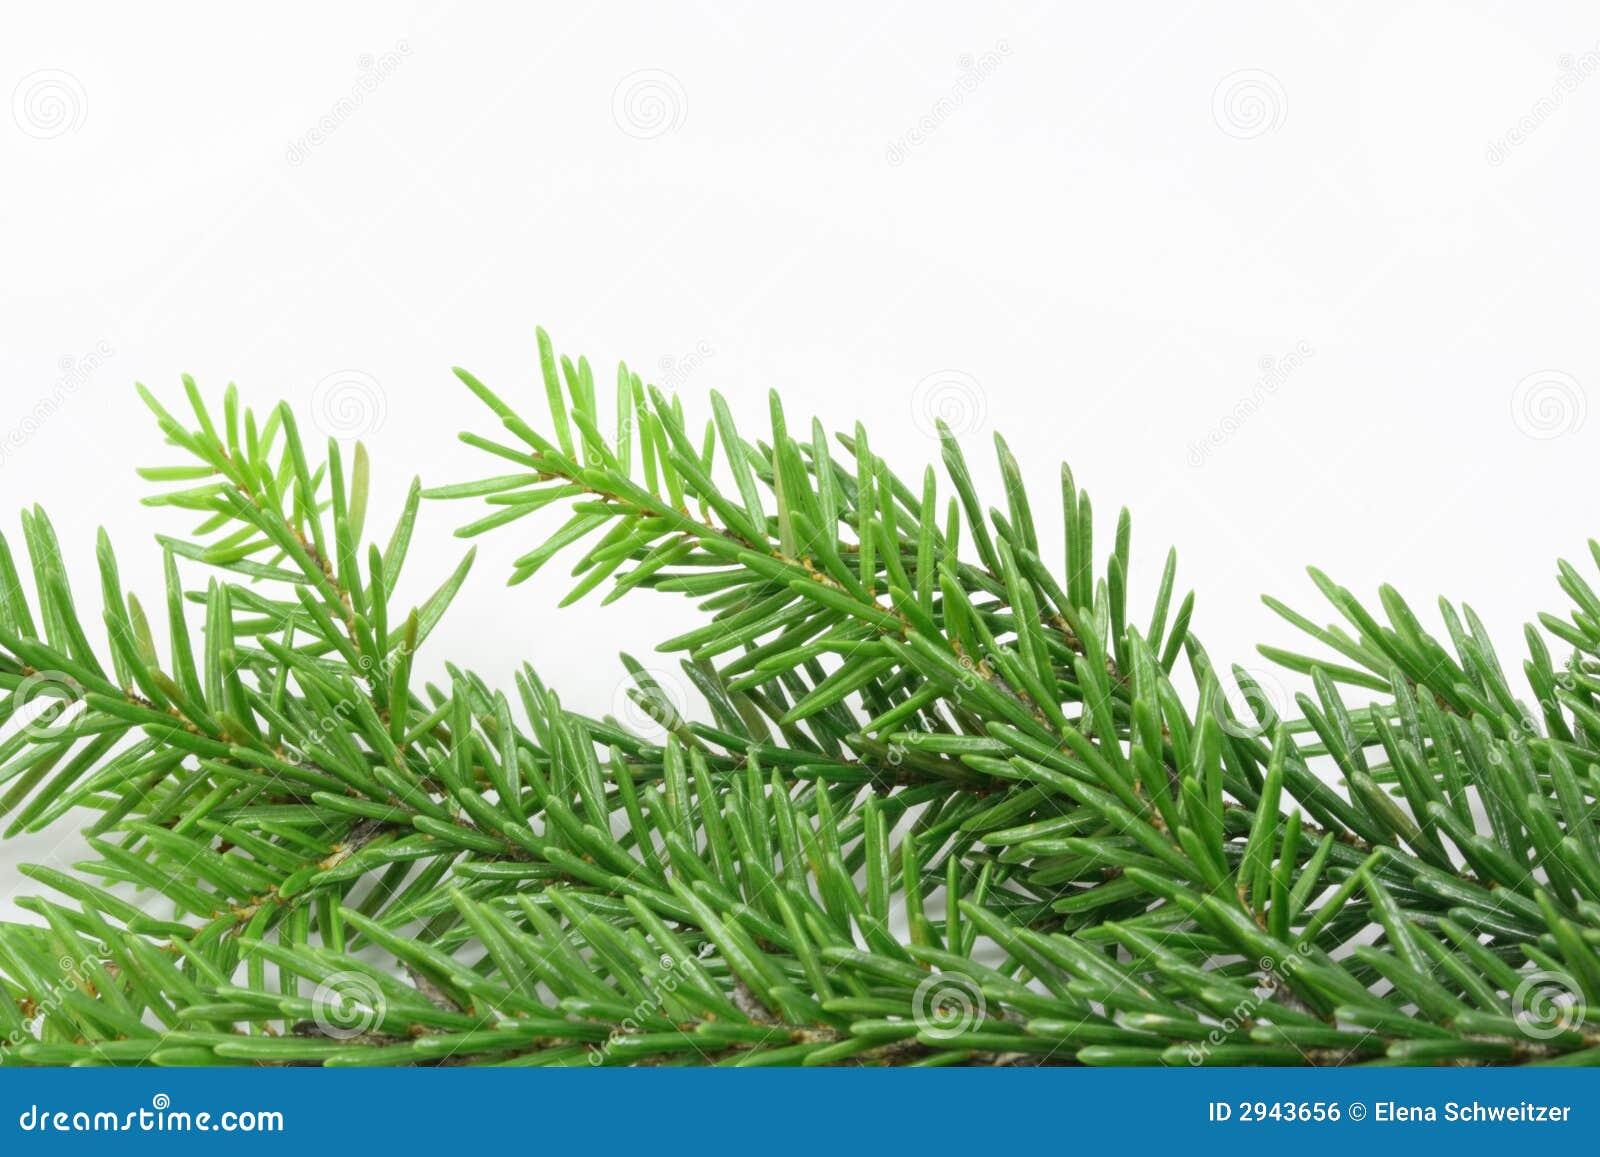 Christmas Tree Bough Royalty Free Stock Image - Image: 2943656